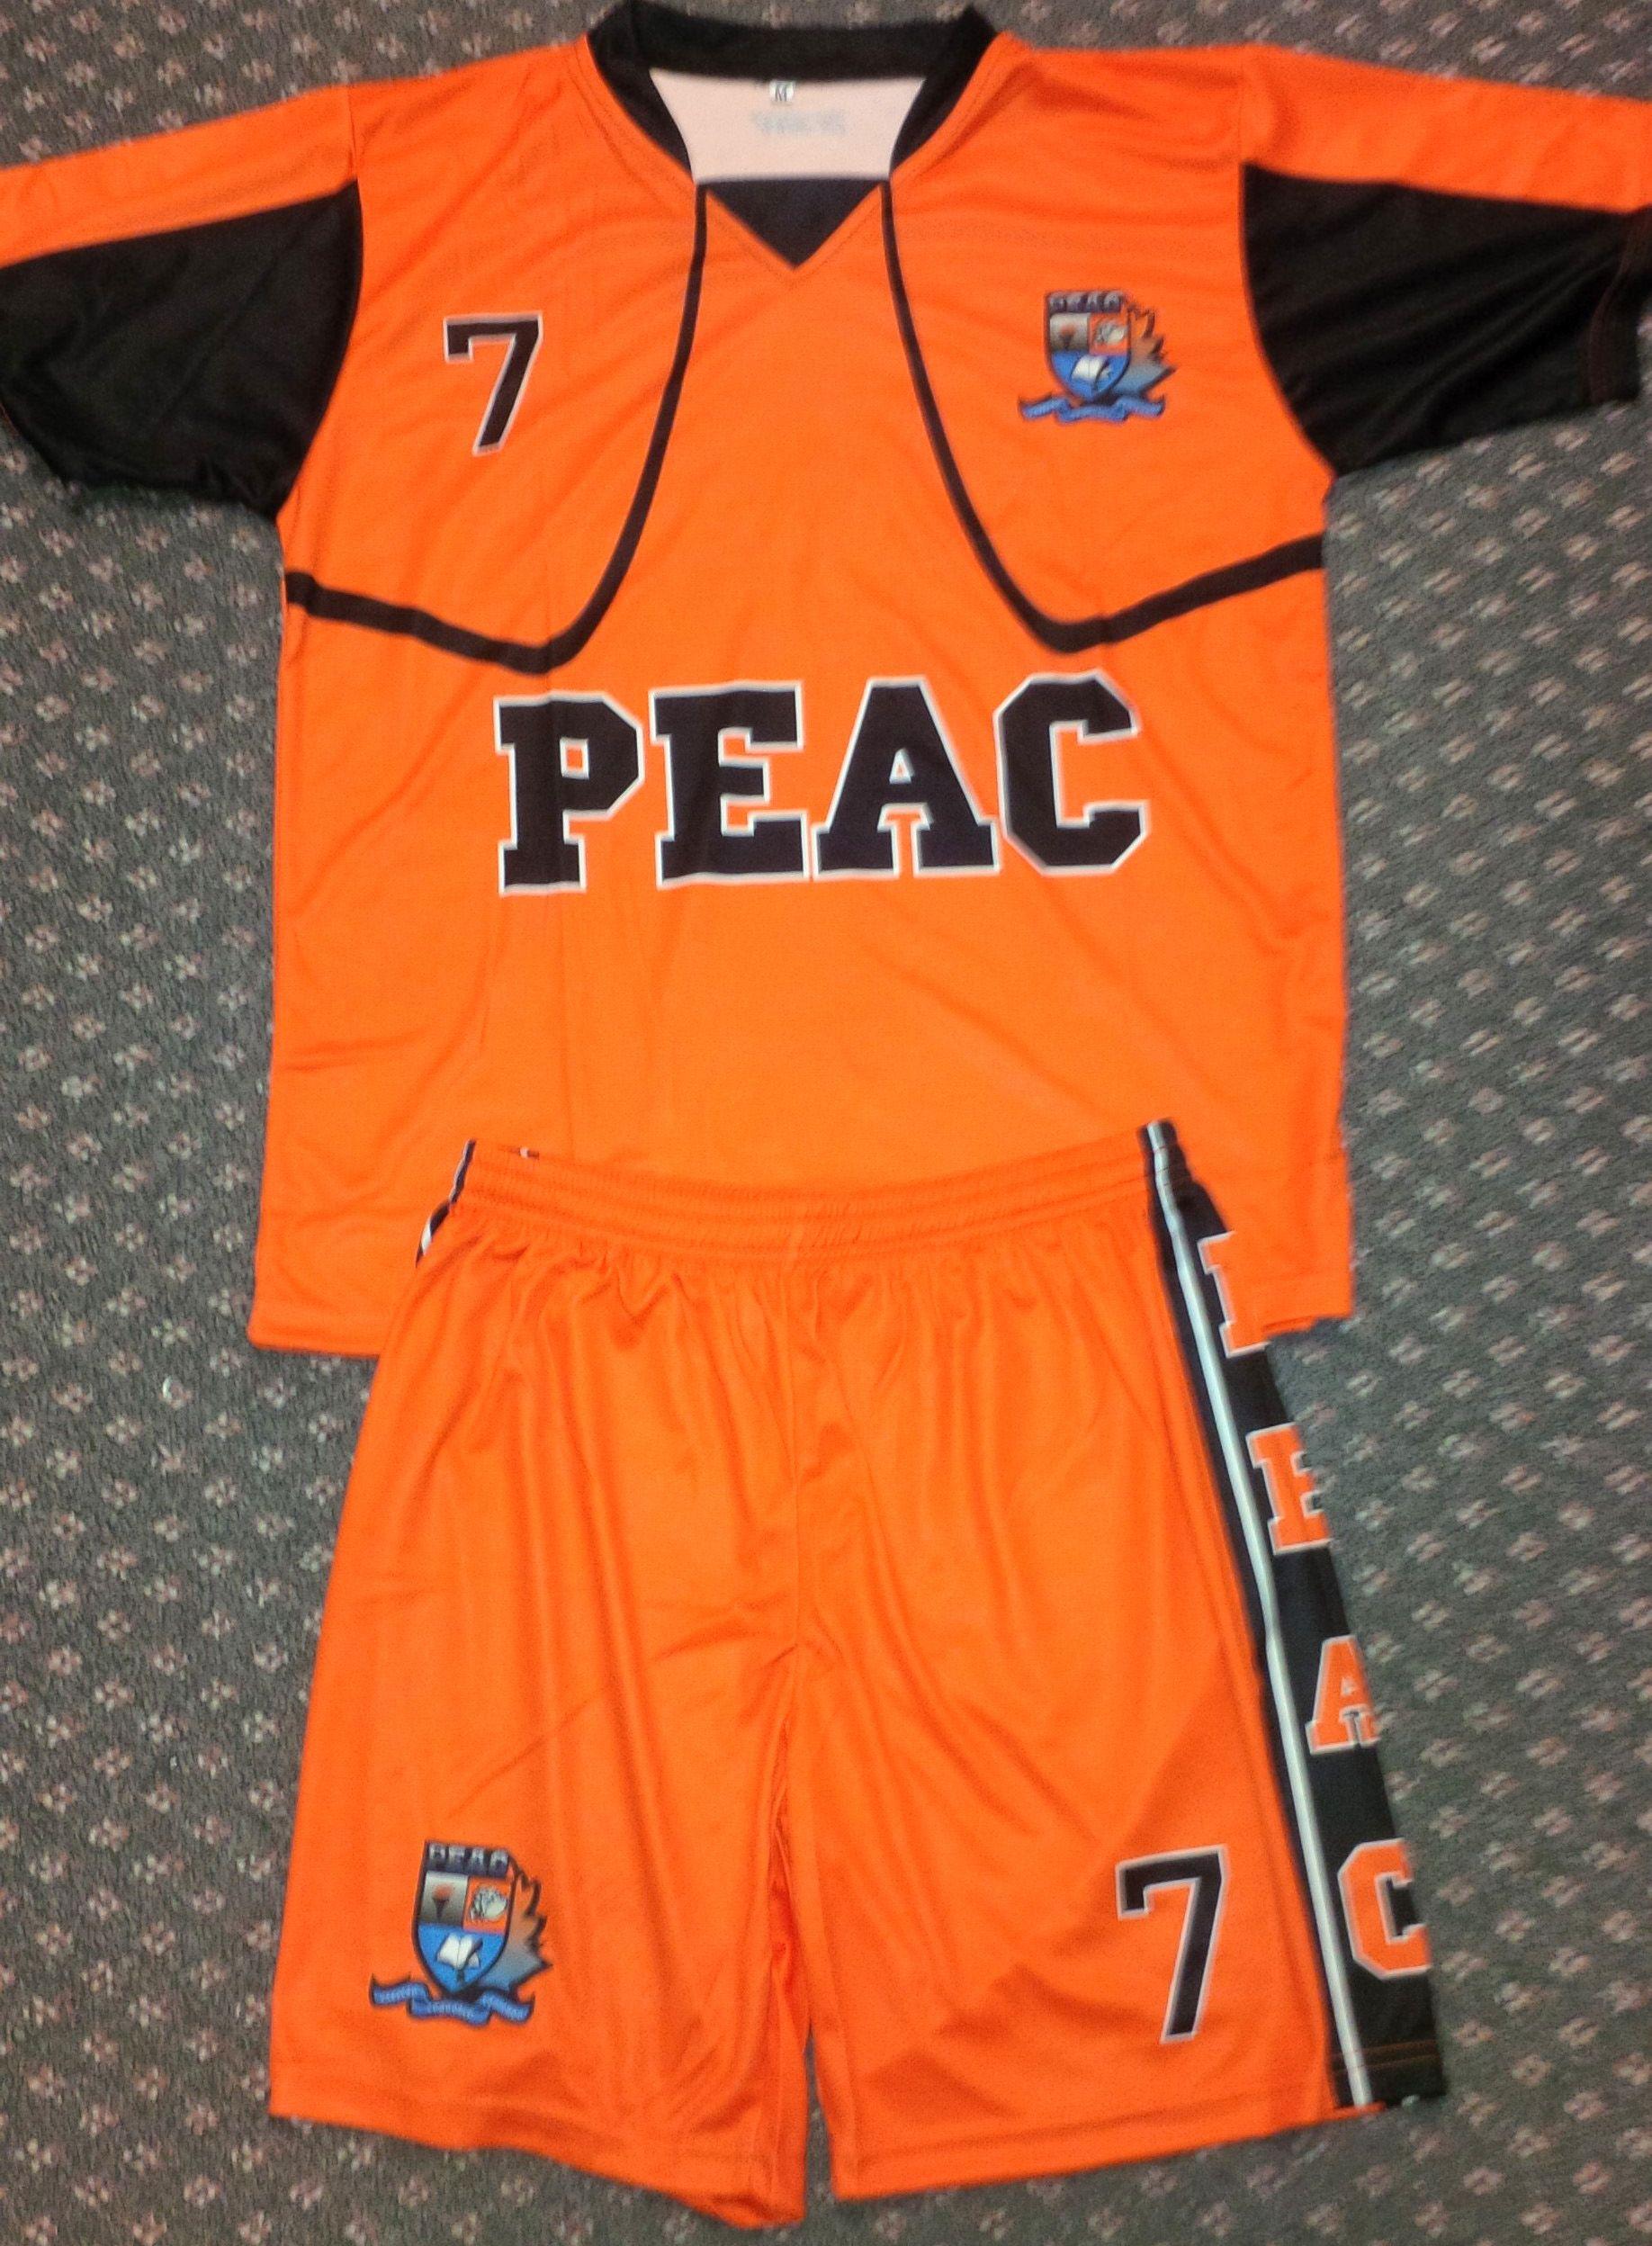 Custom sublimated soccer uniform for P.E.A.C.  GitchSW Facebook - Gitch  Sportswear 05c8bbbb4